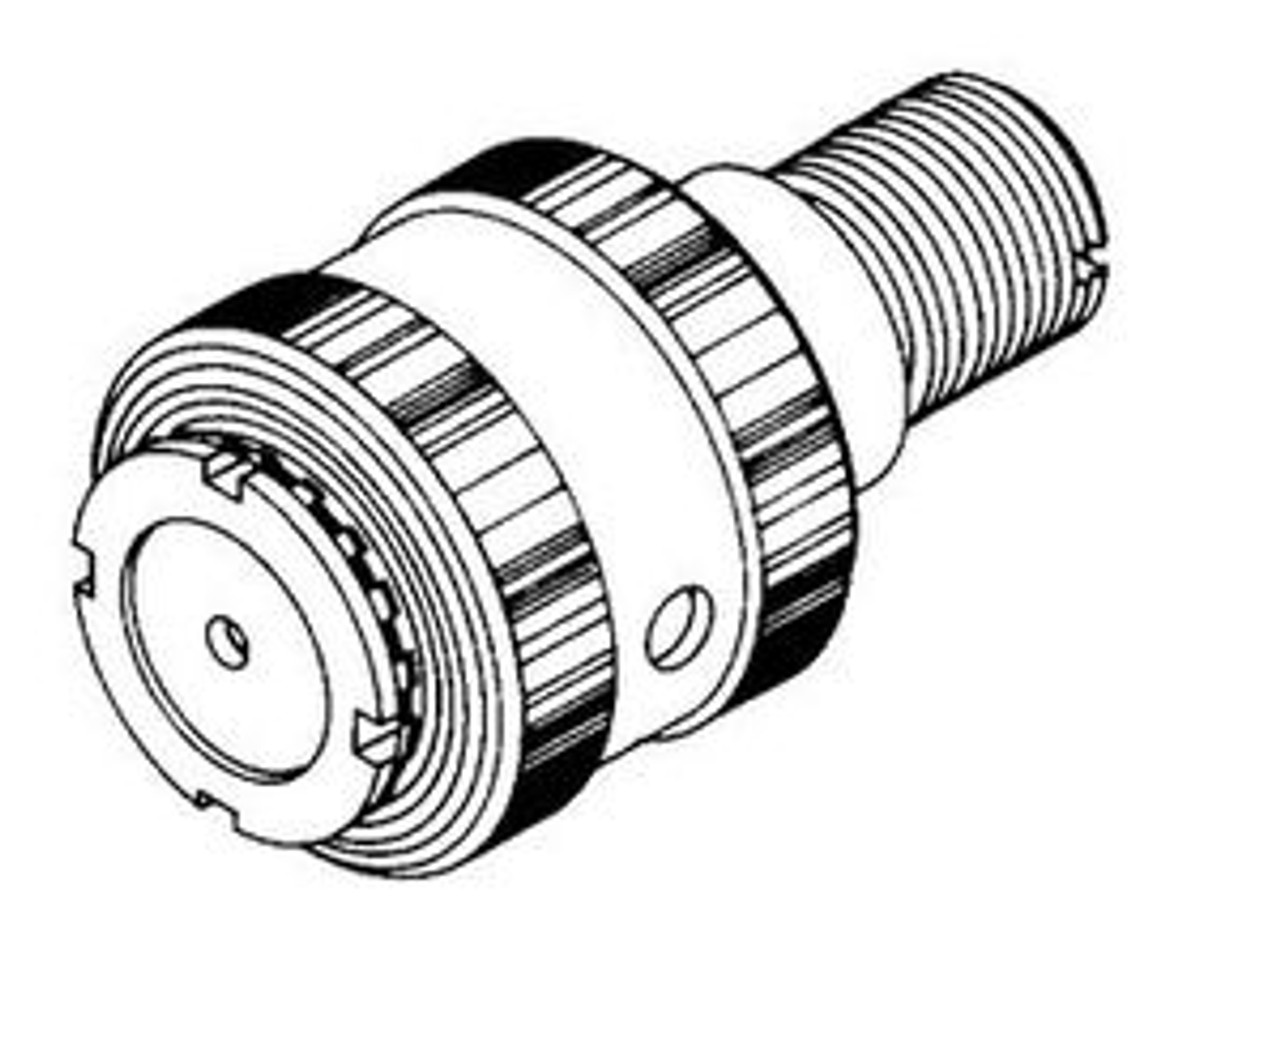 Biro Saw - Upper Main Shaft & Bearing Assembly - 22,1433,33,34,3334 - B033A-247